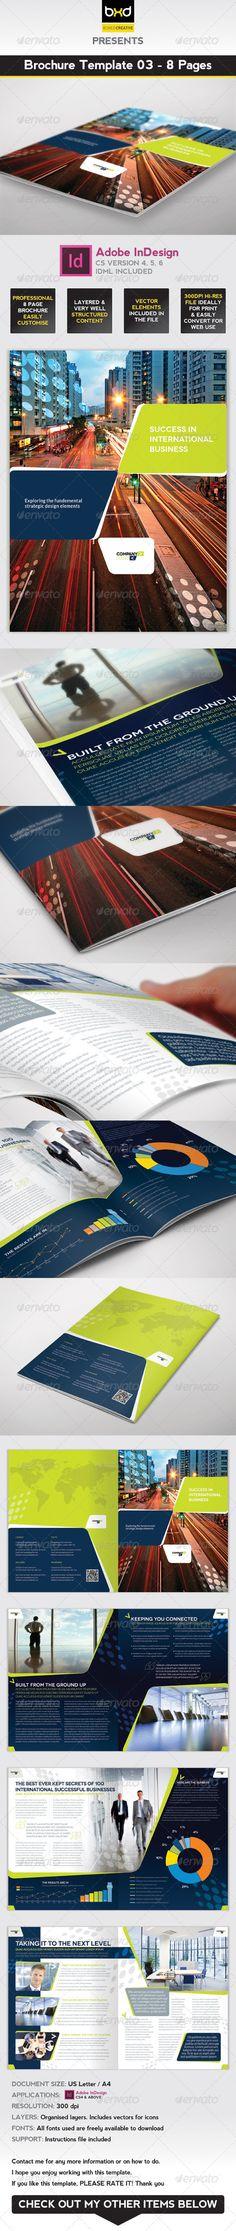 information brochure templates